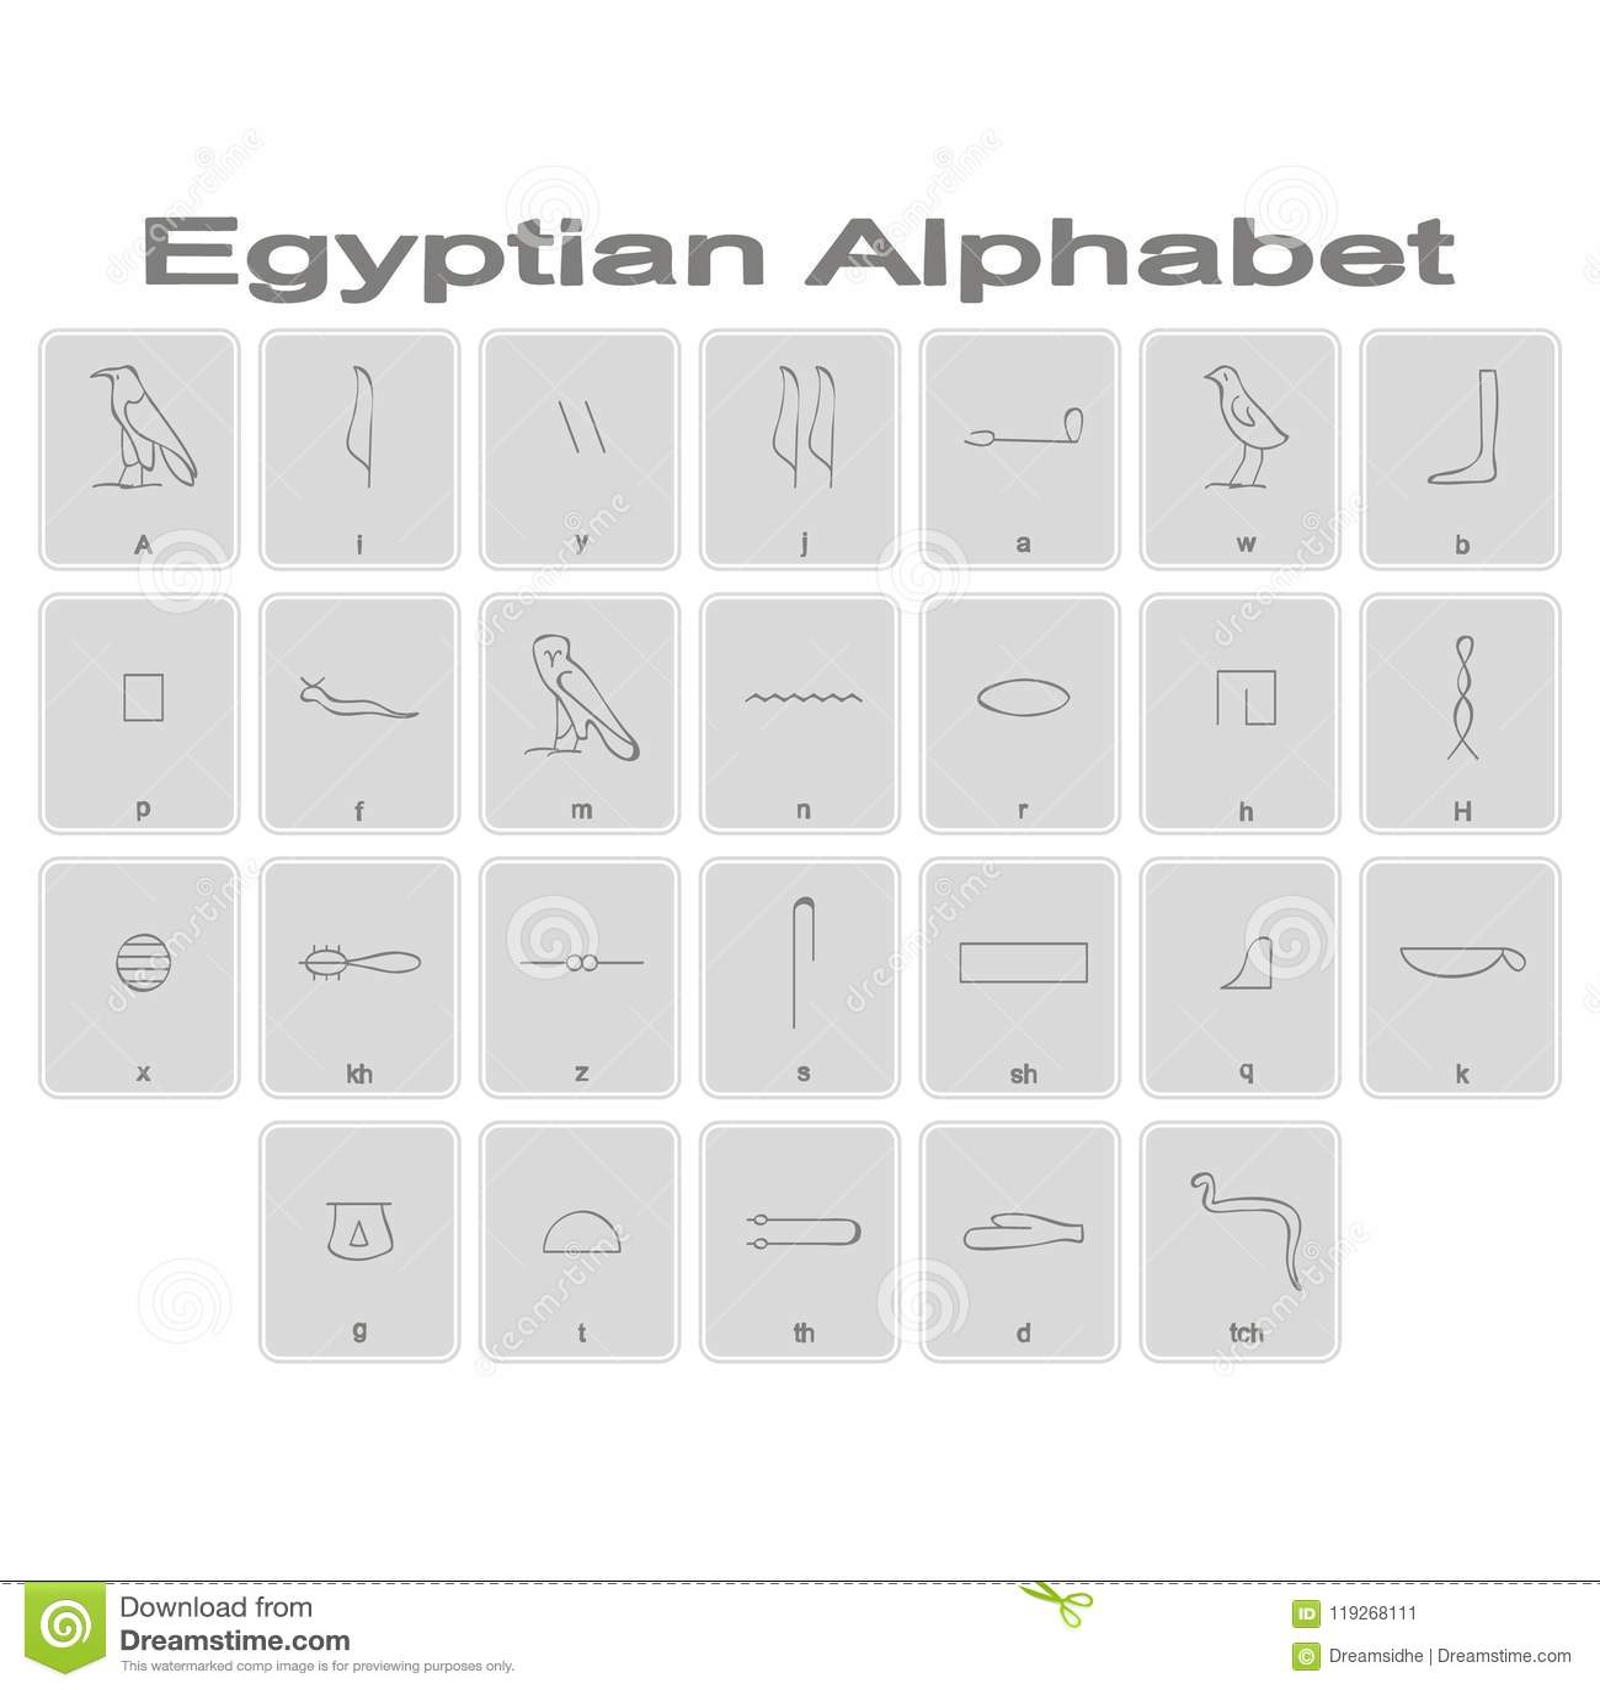 Set Of Monochrome Icons With Egyptian Hieroglyphic